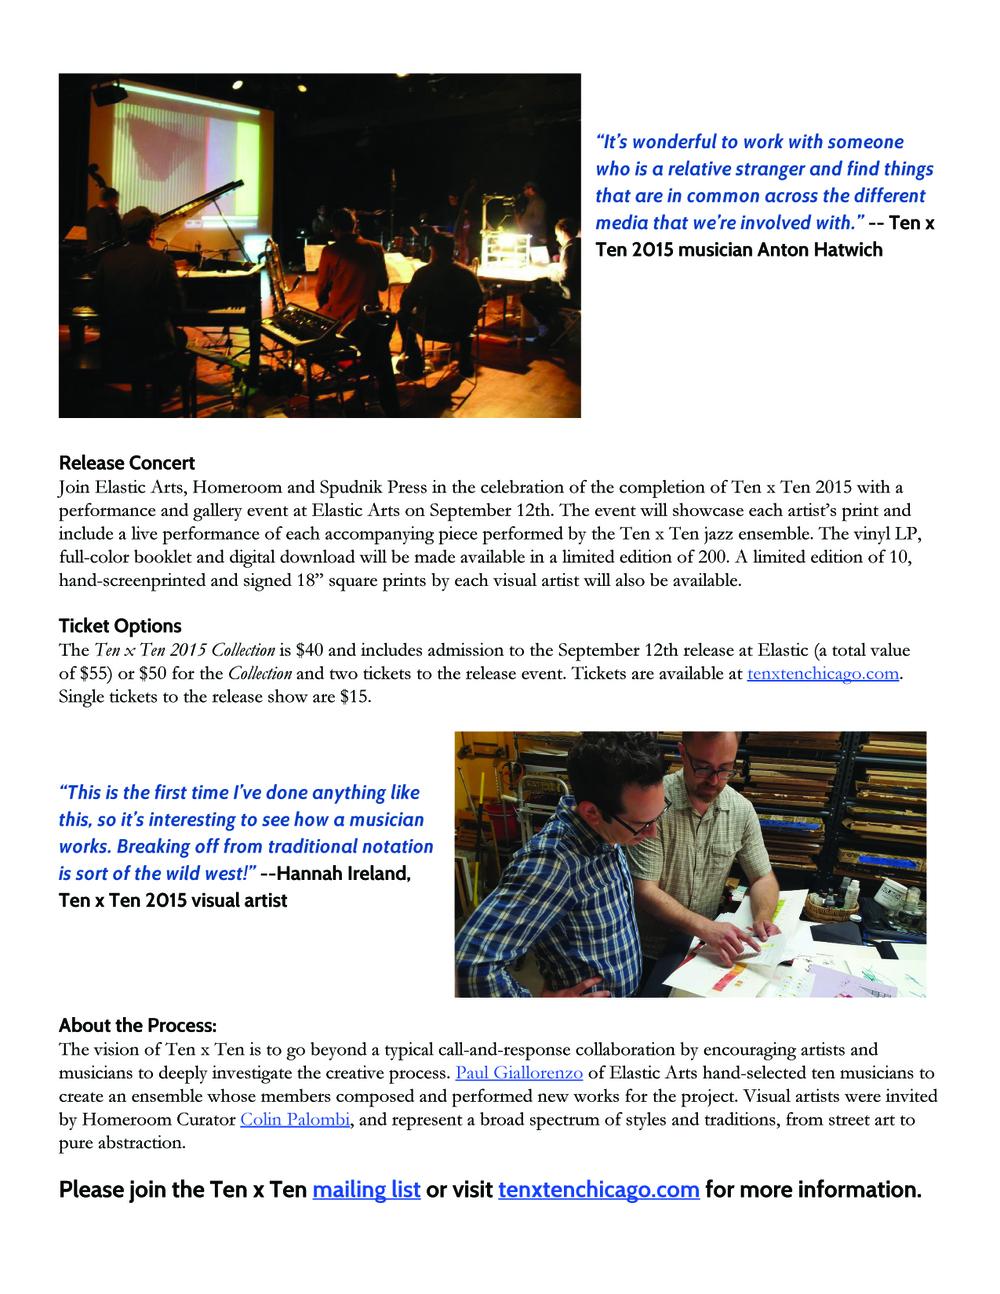 Ten x Ten 2015 Press Release 2/5